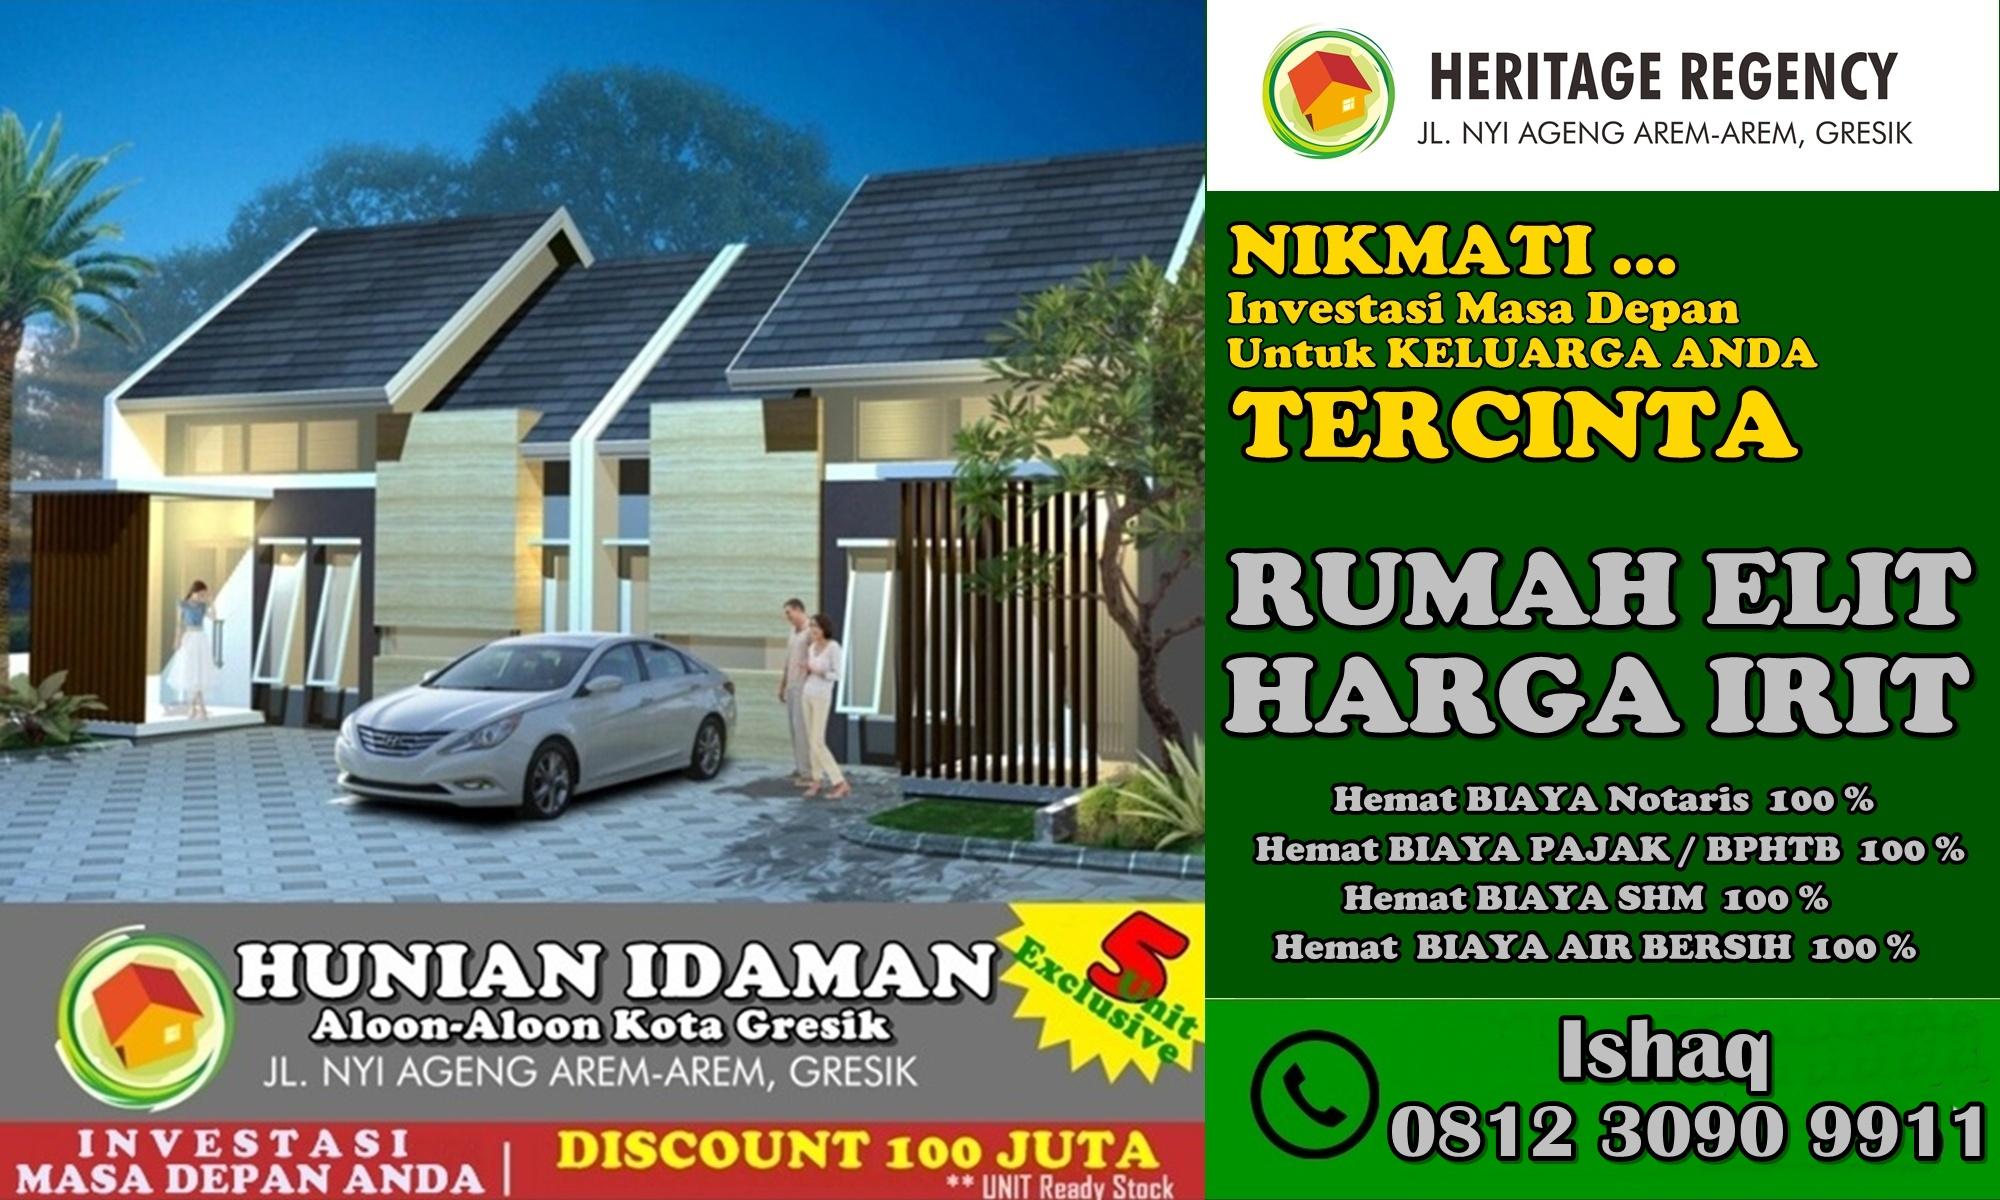 Olx Rumah Gresik Kota - 081230909911 - Heritage Regency